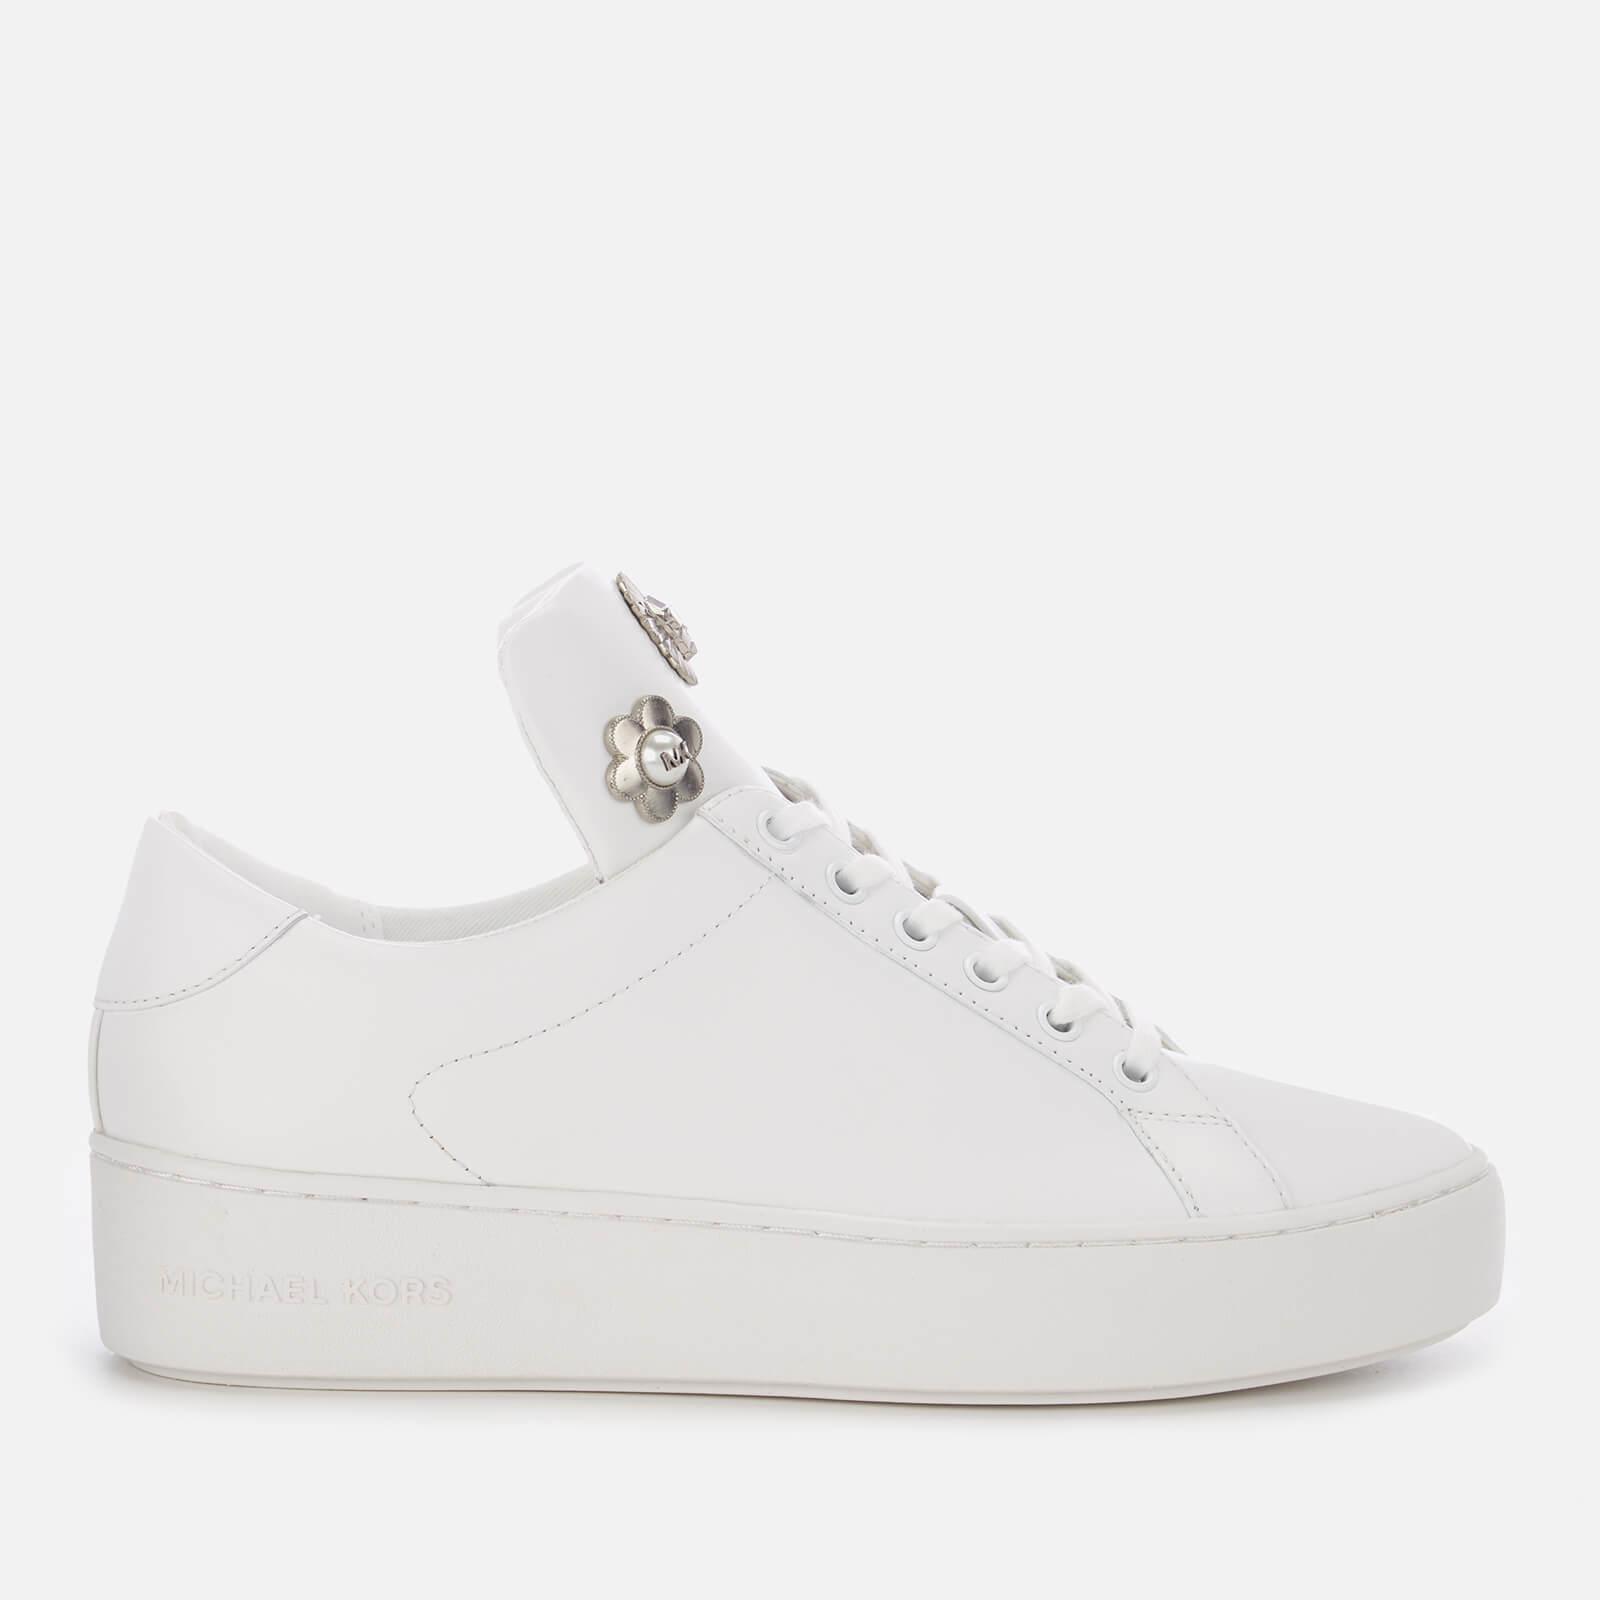 d27ec5286d39 Lyst - Michael Michael Kors Mindy Lace Up Trainers in White